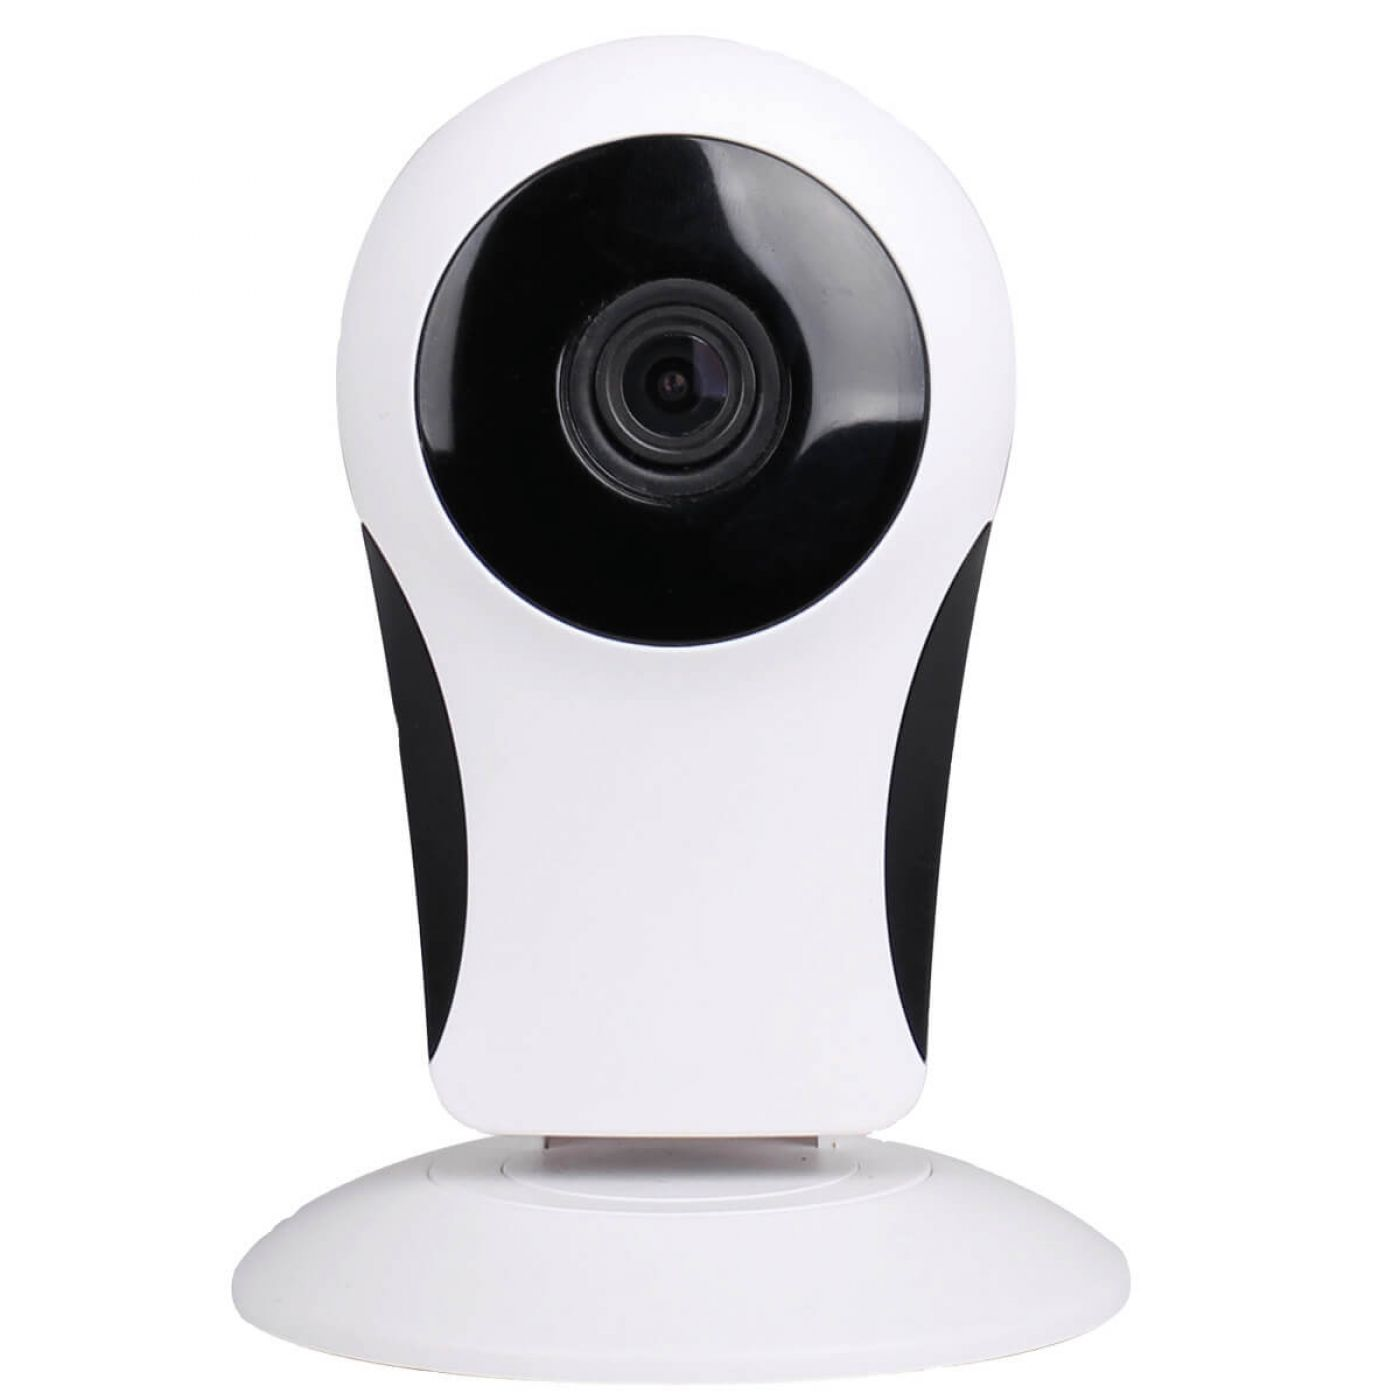 WI-FI панорамная видеокамера, 2 Мп (1920*1080), ИК-подсветка 20 м, Звук, Обзор 180°, SD карта до 128 G